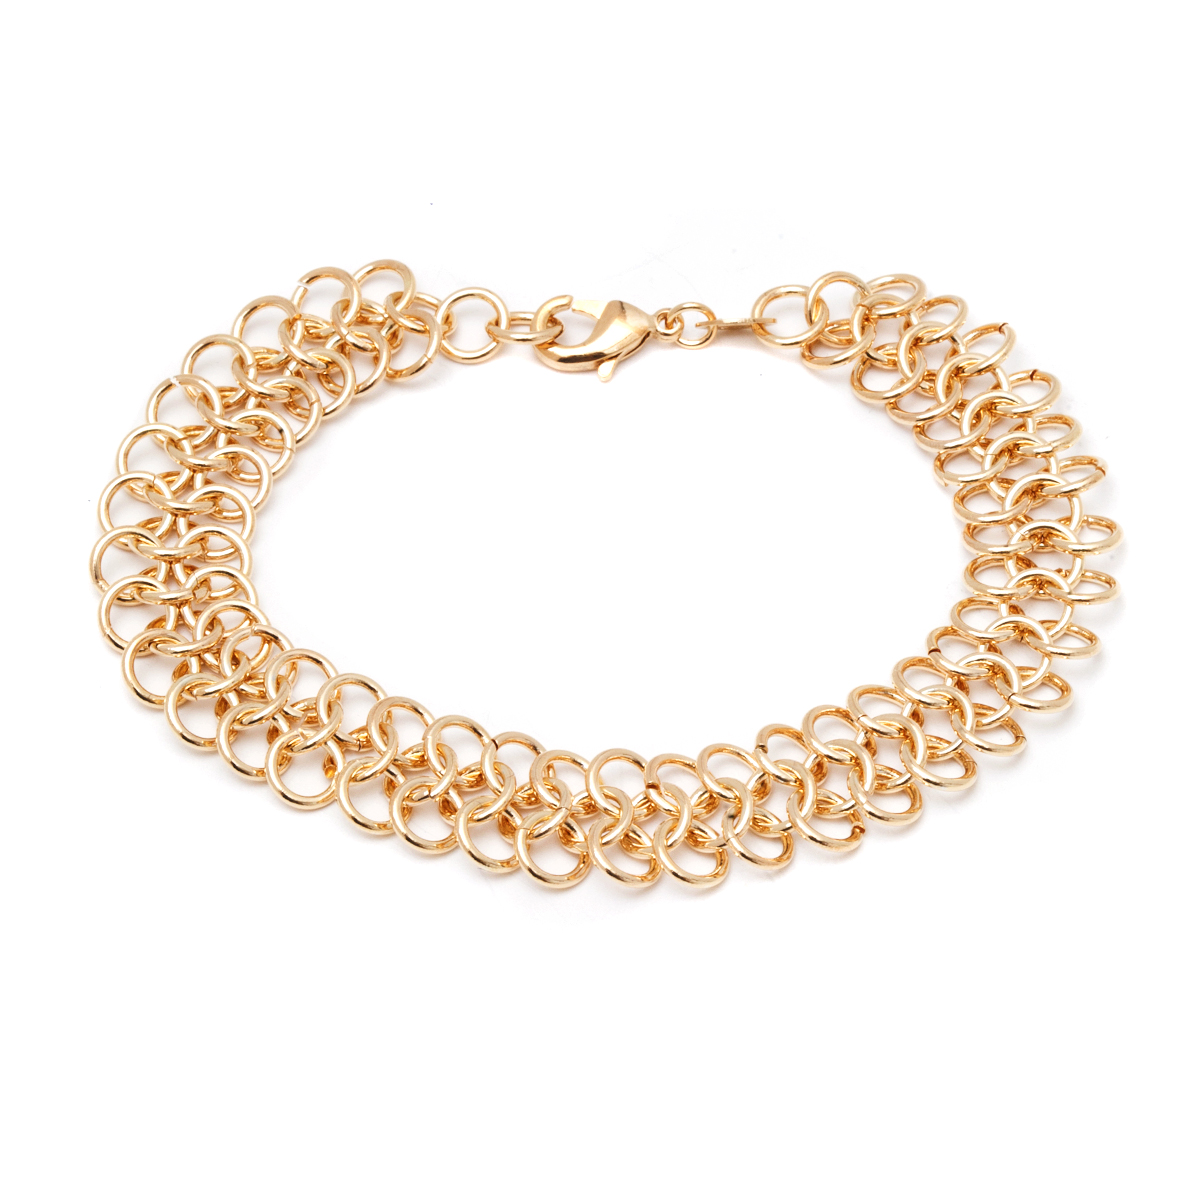 Gold Plated Interlocking Link Bracelet 1e423e468665